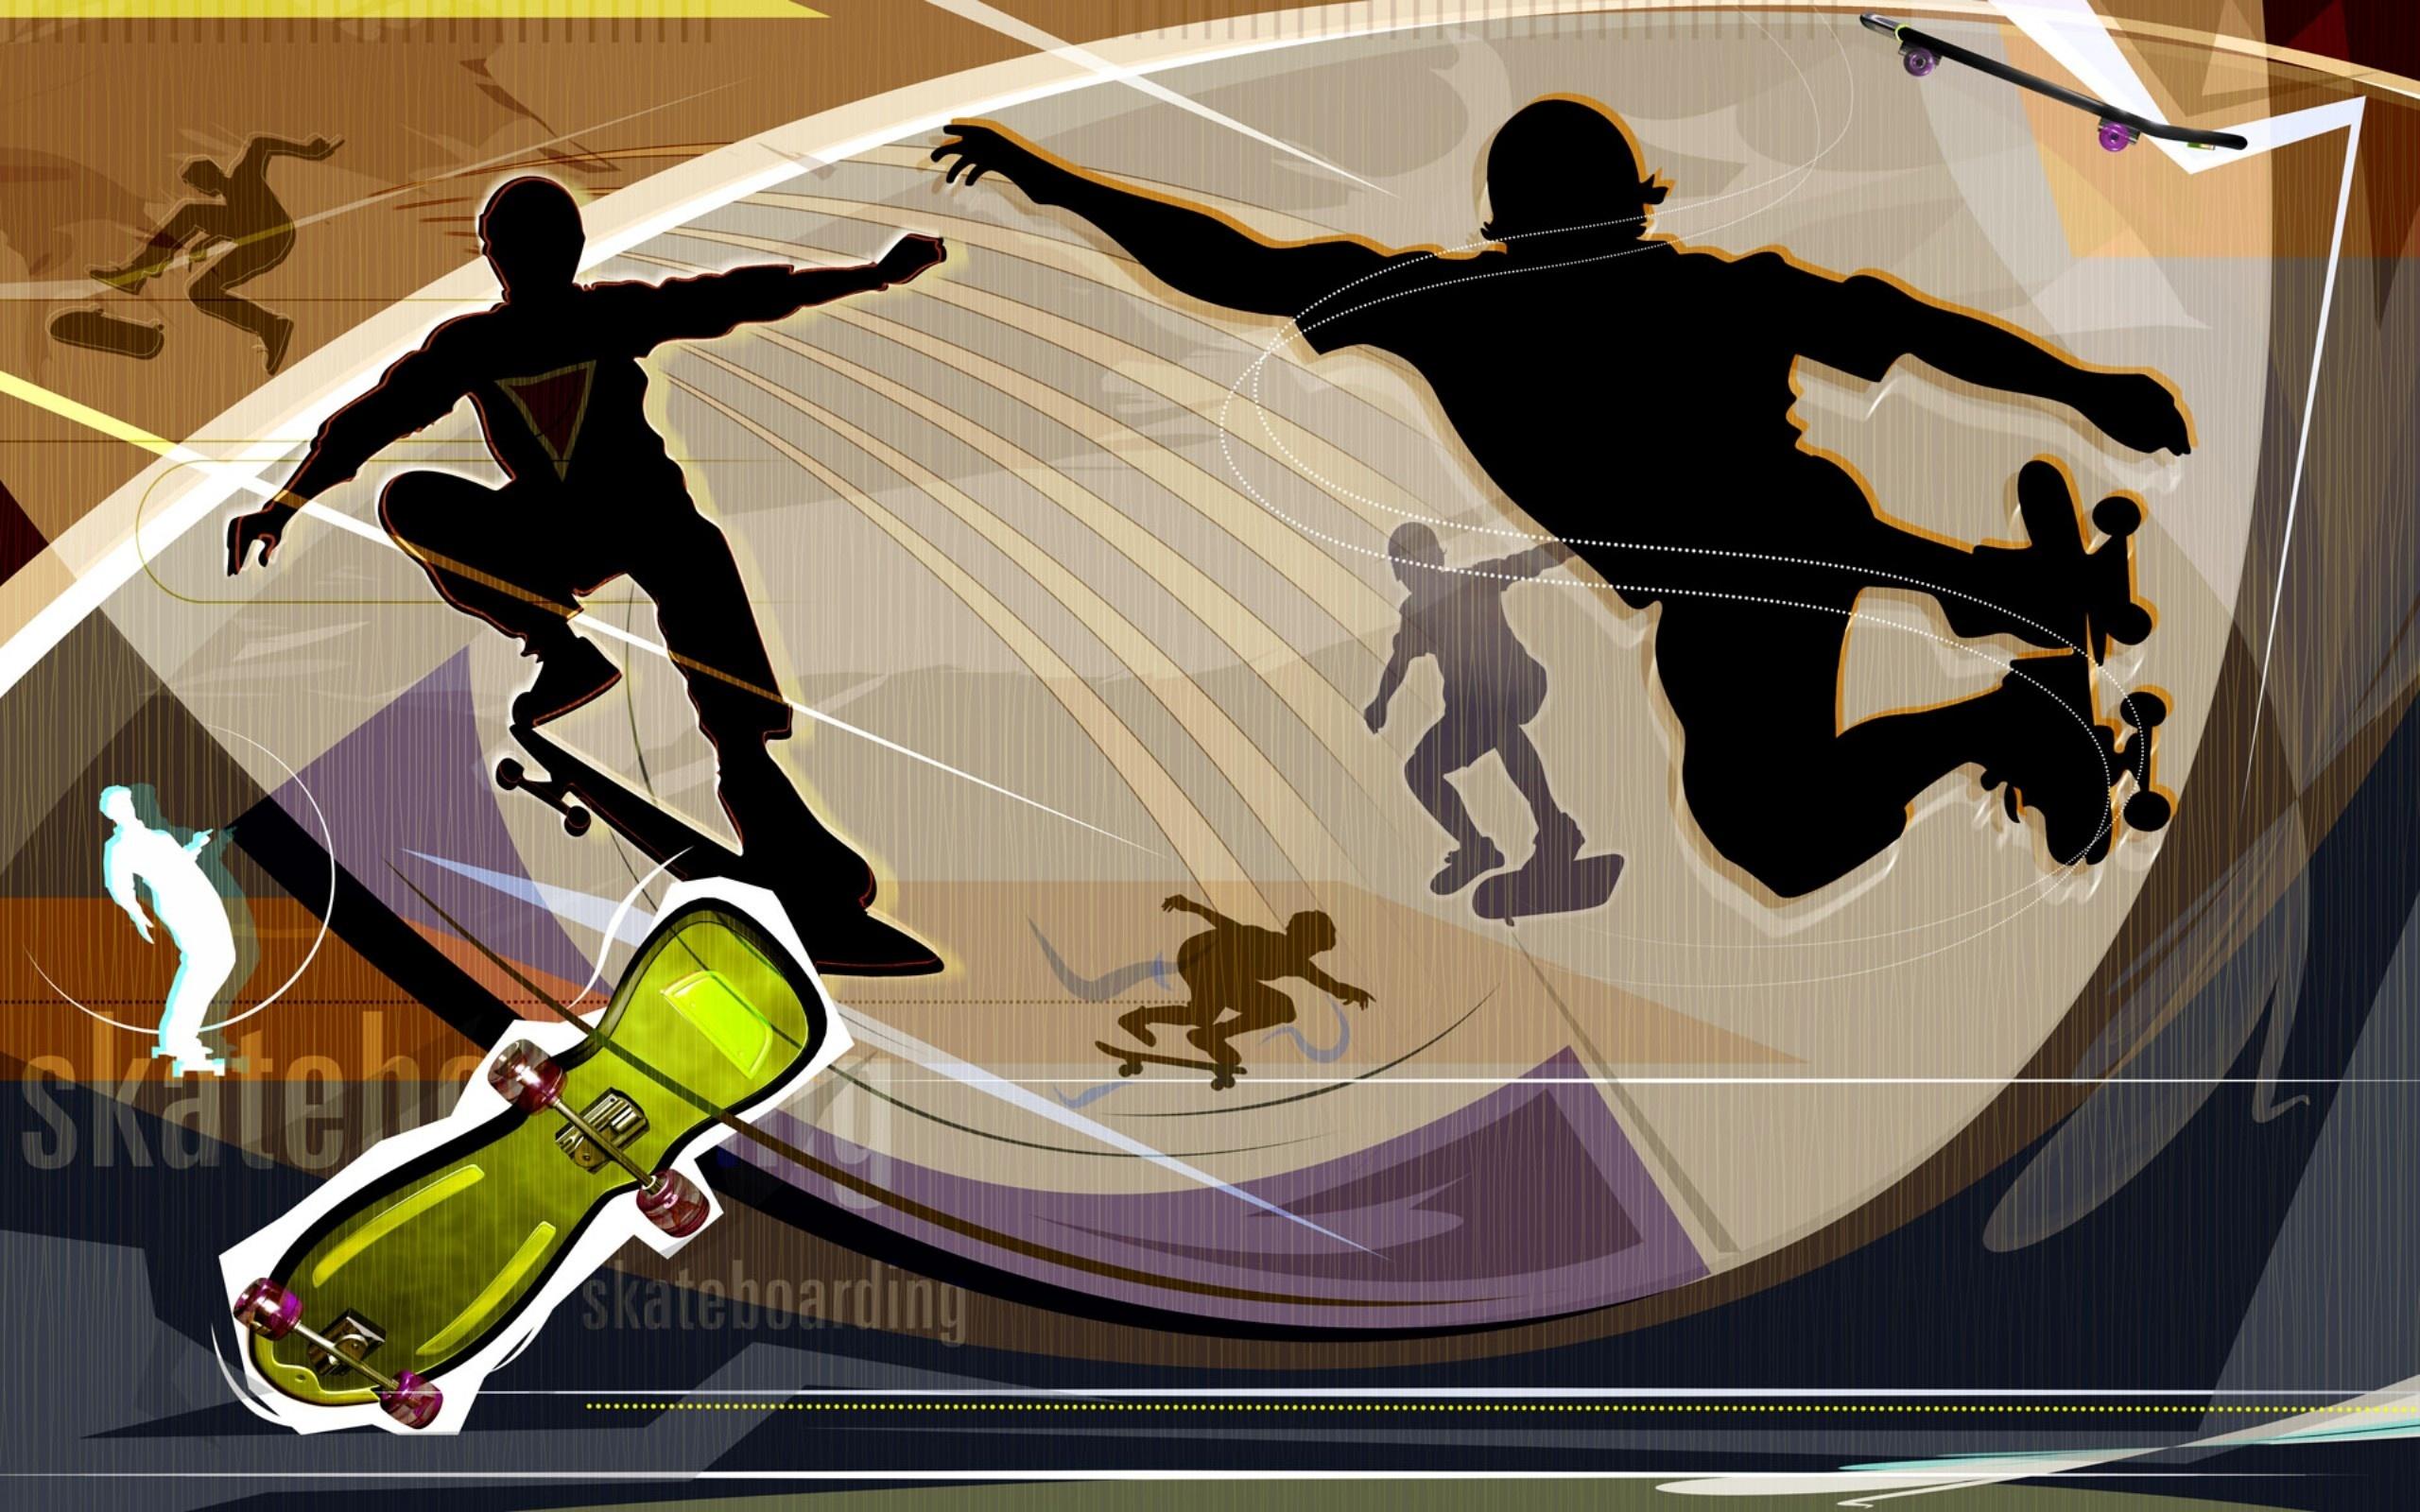 Skateboarding Full HD Wallpaper And Background Image